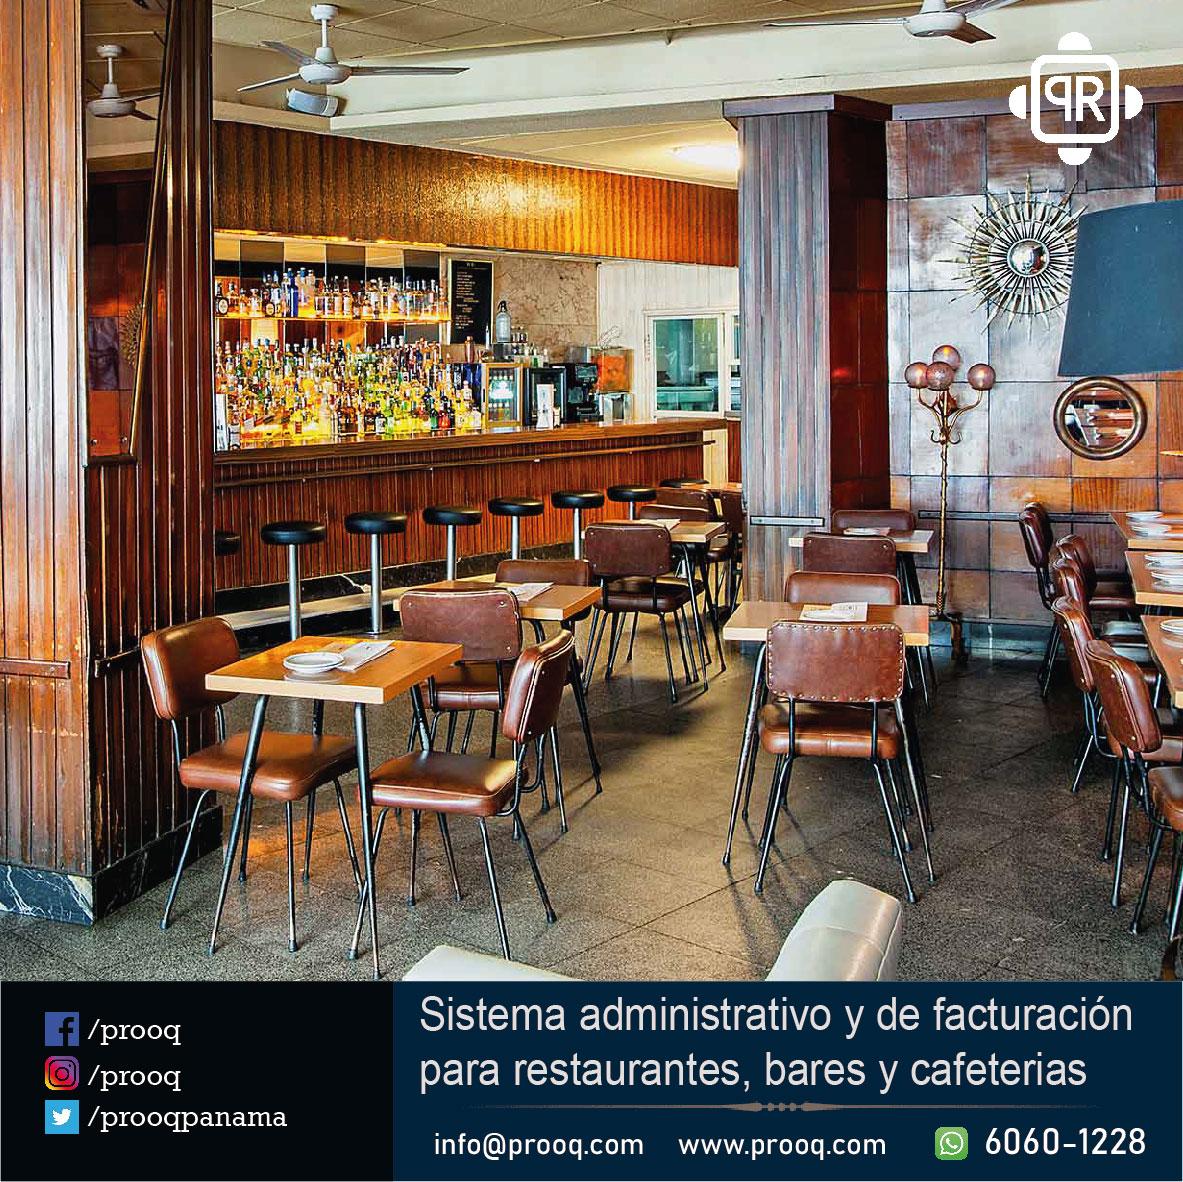 #retailpos #restaurantes #bar#panama #pty #panamacity #507 #soporte #tecnico #tecnologia #serviciospanama #administracion #empresas #serviciospanama #leyfiscal #dgi #itbms #pymes #sistemafiscal #software #ofertapty #serviciospanama #cafe